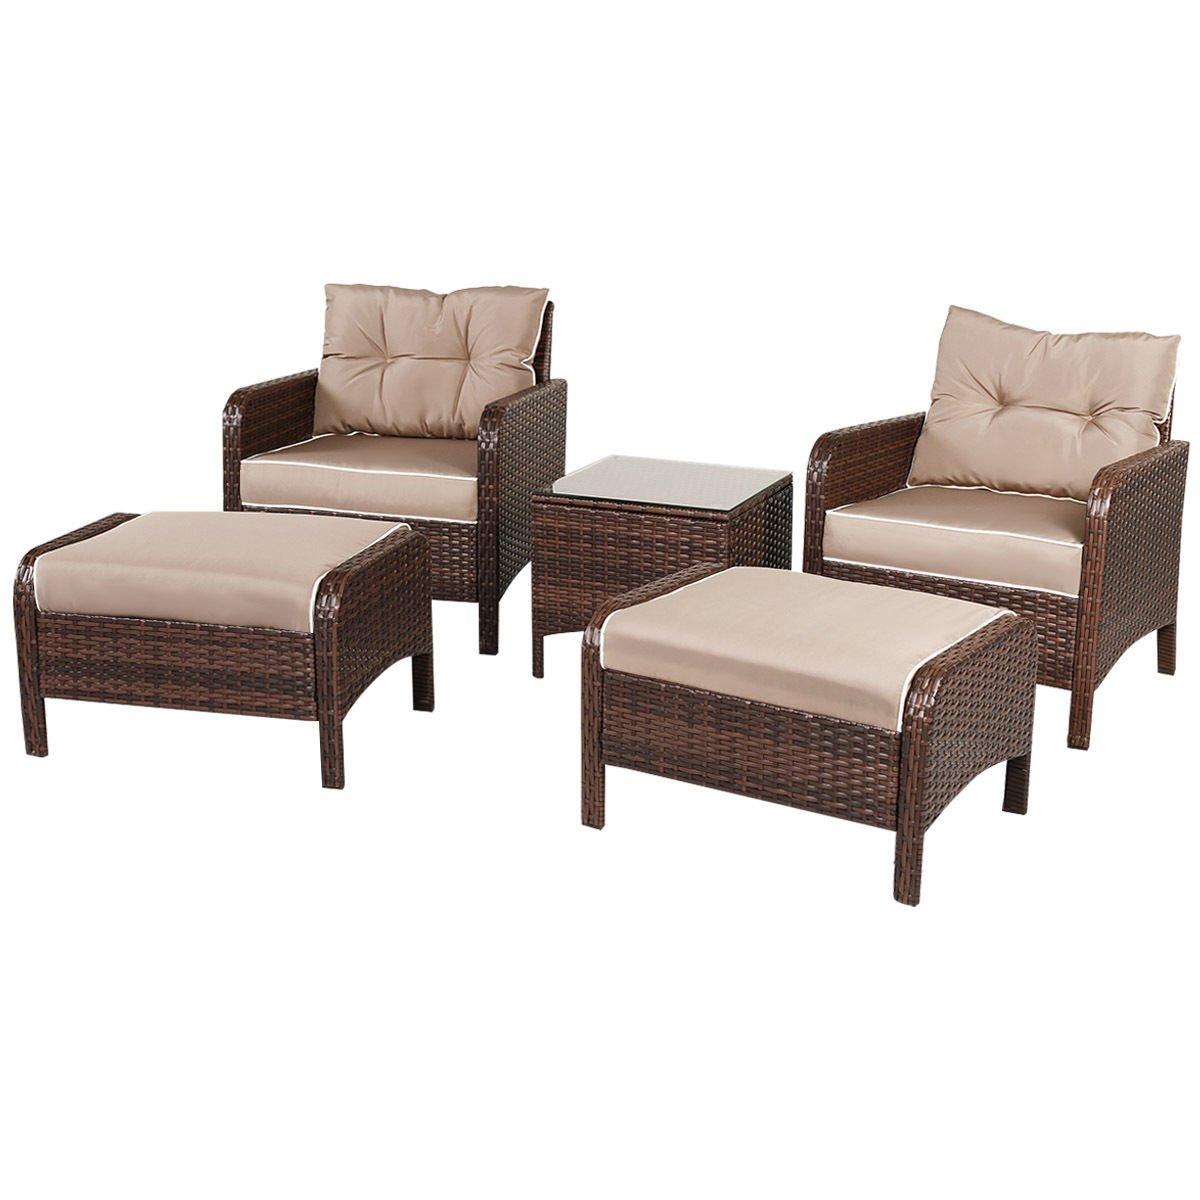 Tangkula Wicker Furniture Set 5 Pieces Pe Wicker Rattan